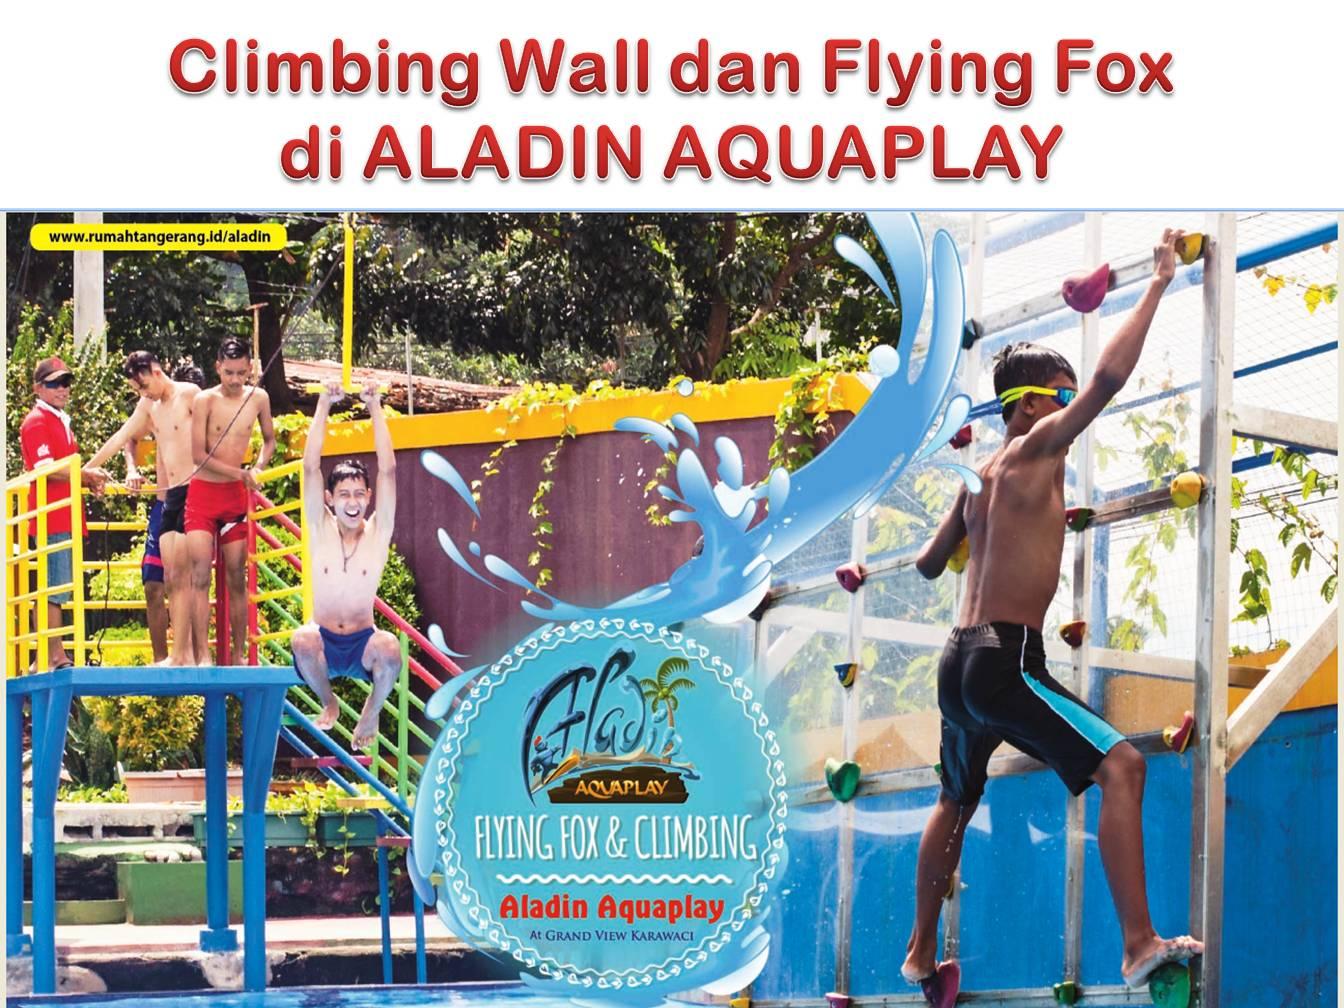 ALADIN AQUAPLAY di Grand View Karawaci Tangerang Telpon (021) 5988 199 – Yelli 089694309541